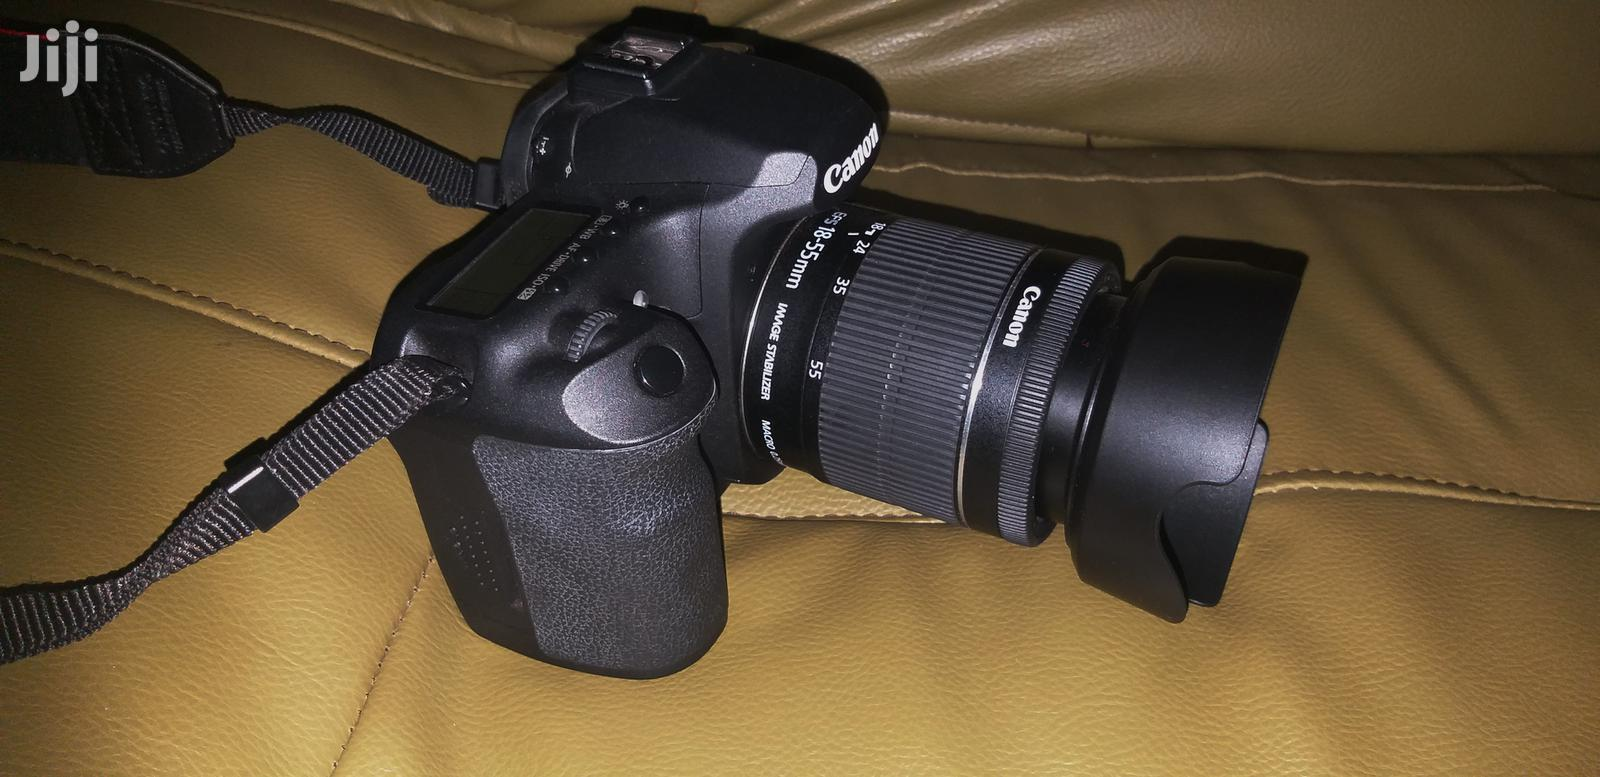 Canon EOS 50D DSLR Camera | Photo & Video Cameras for sale in Kampala, Central Region, Uganda